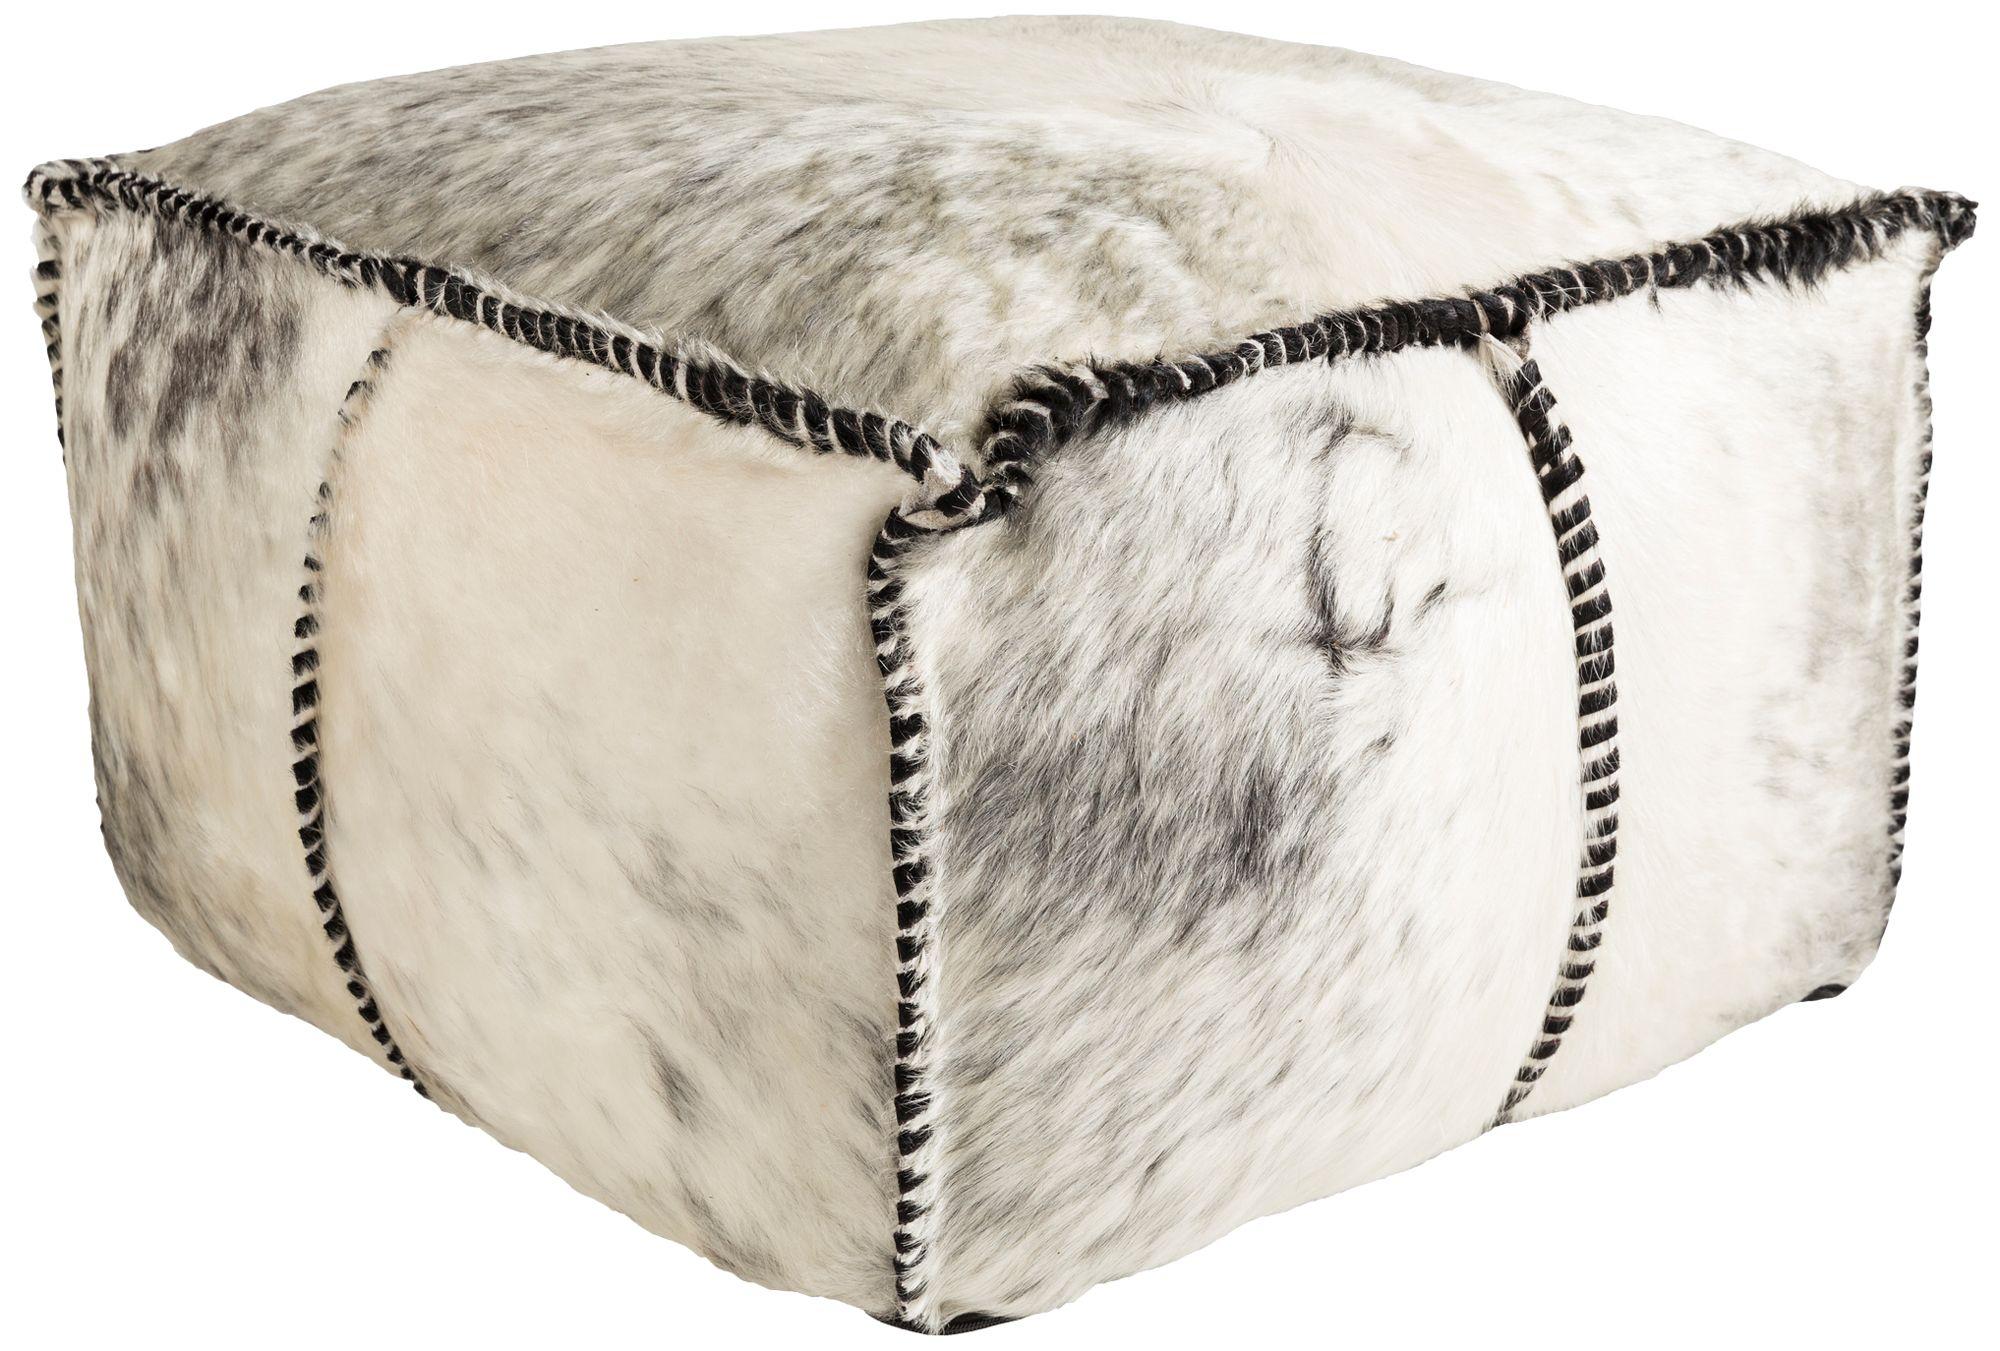 surya ranger black white hair on hide leather pouf ottoman